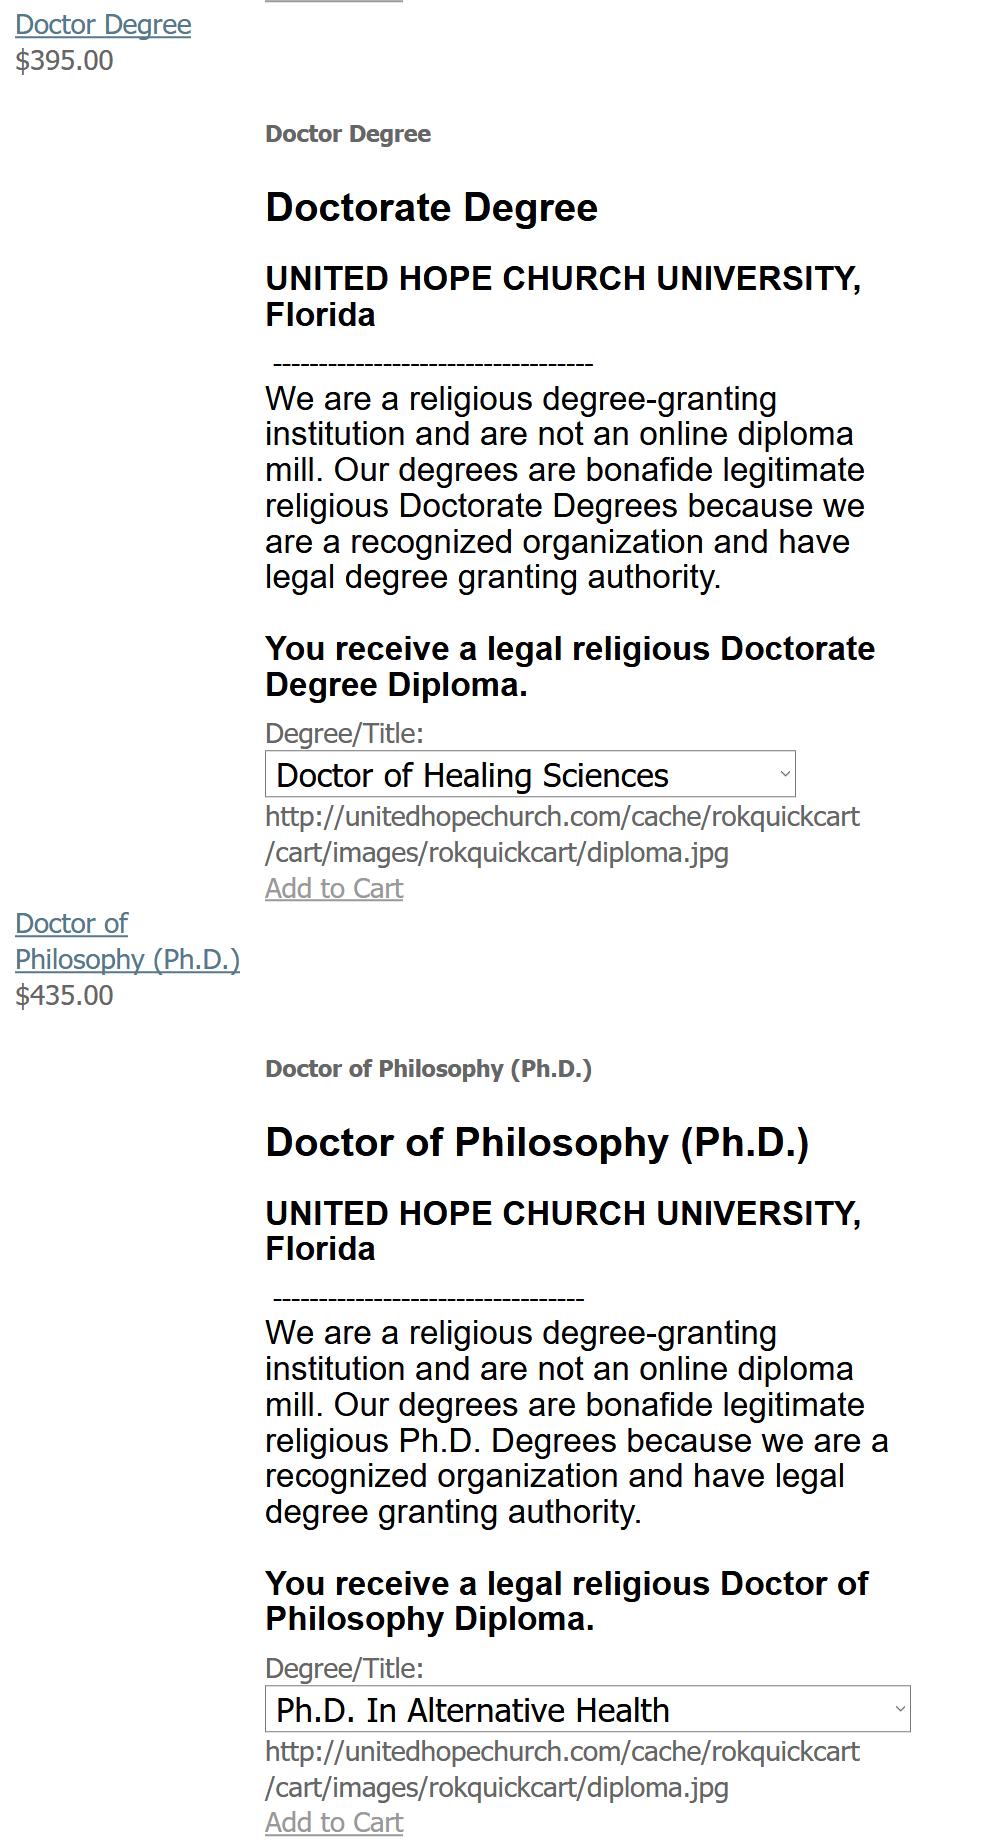 "6. kép: A ""United Hope Church University"" <a href='https://web.archive.org/web/20100408114240/http://unitedhopechurch.com/index.php?option=com_rokquickcart&view=rokquickcart&Itemid=81&lang=en#rokquickcart'>árjegyzékének részlete 2010-ből</a>"